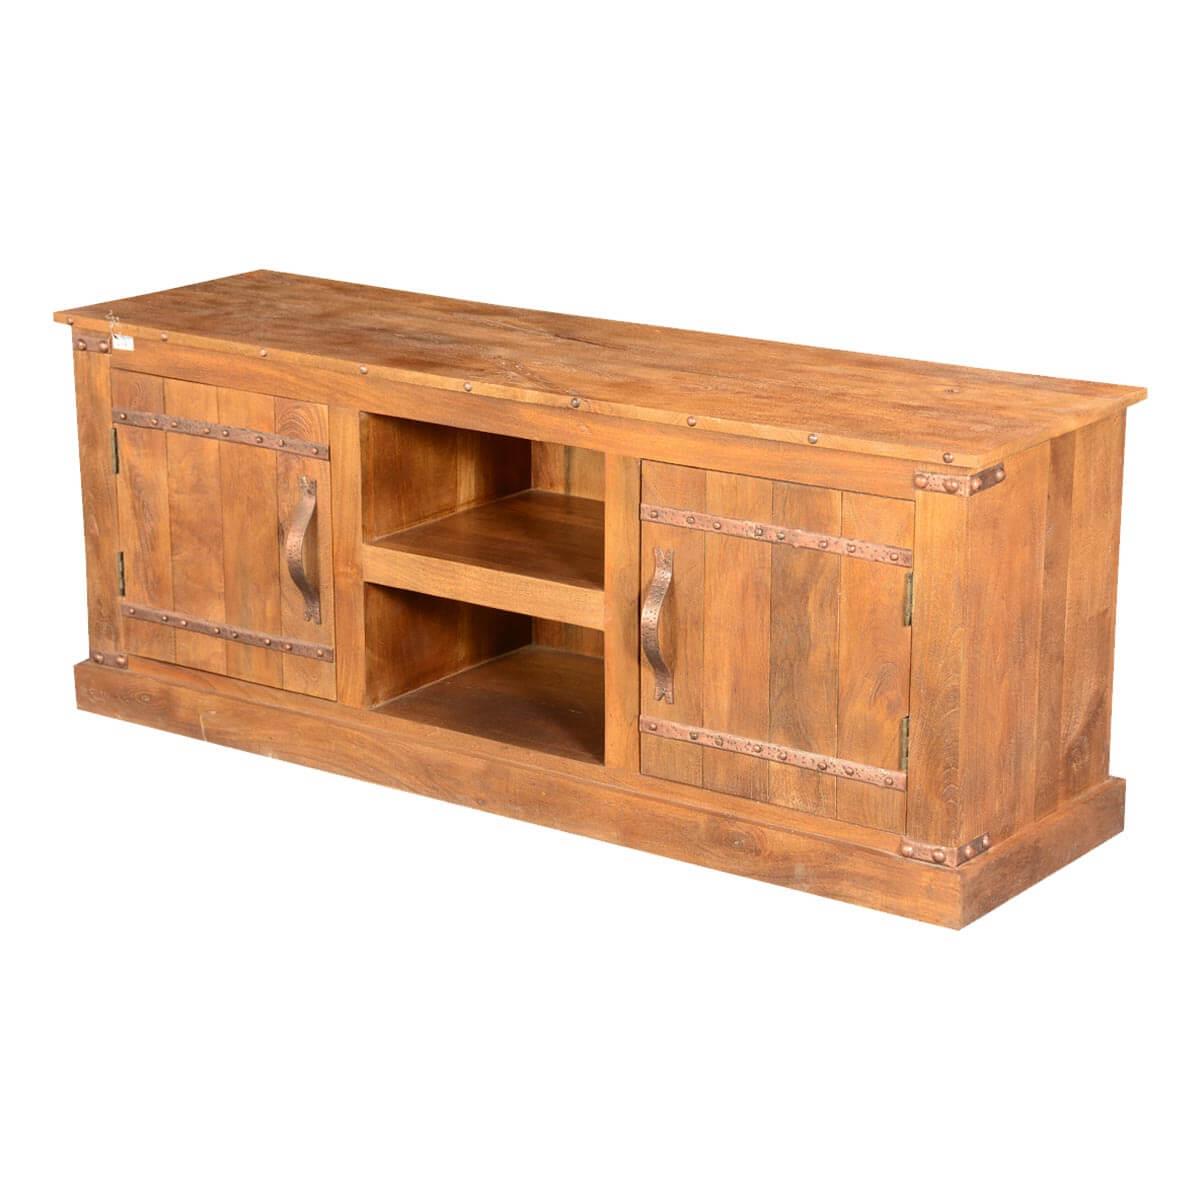 Modern farmhouse rustic solid mango wood tv media console